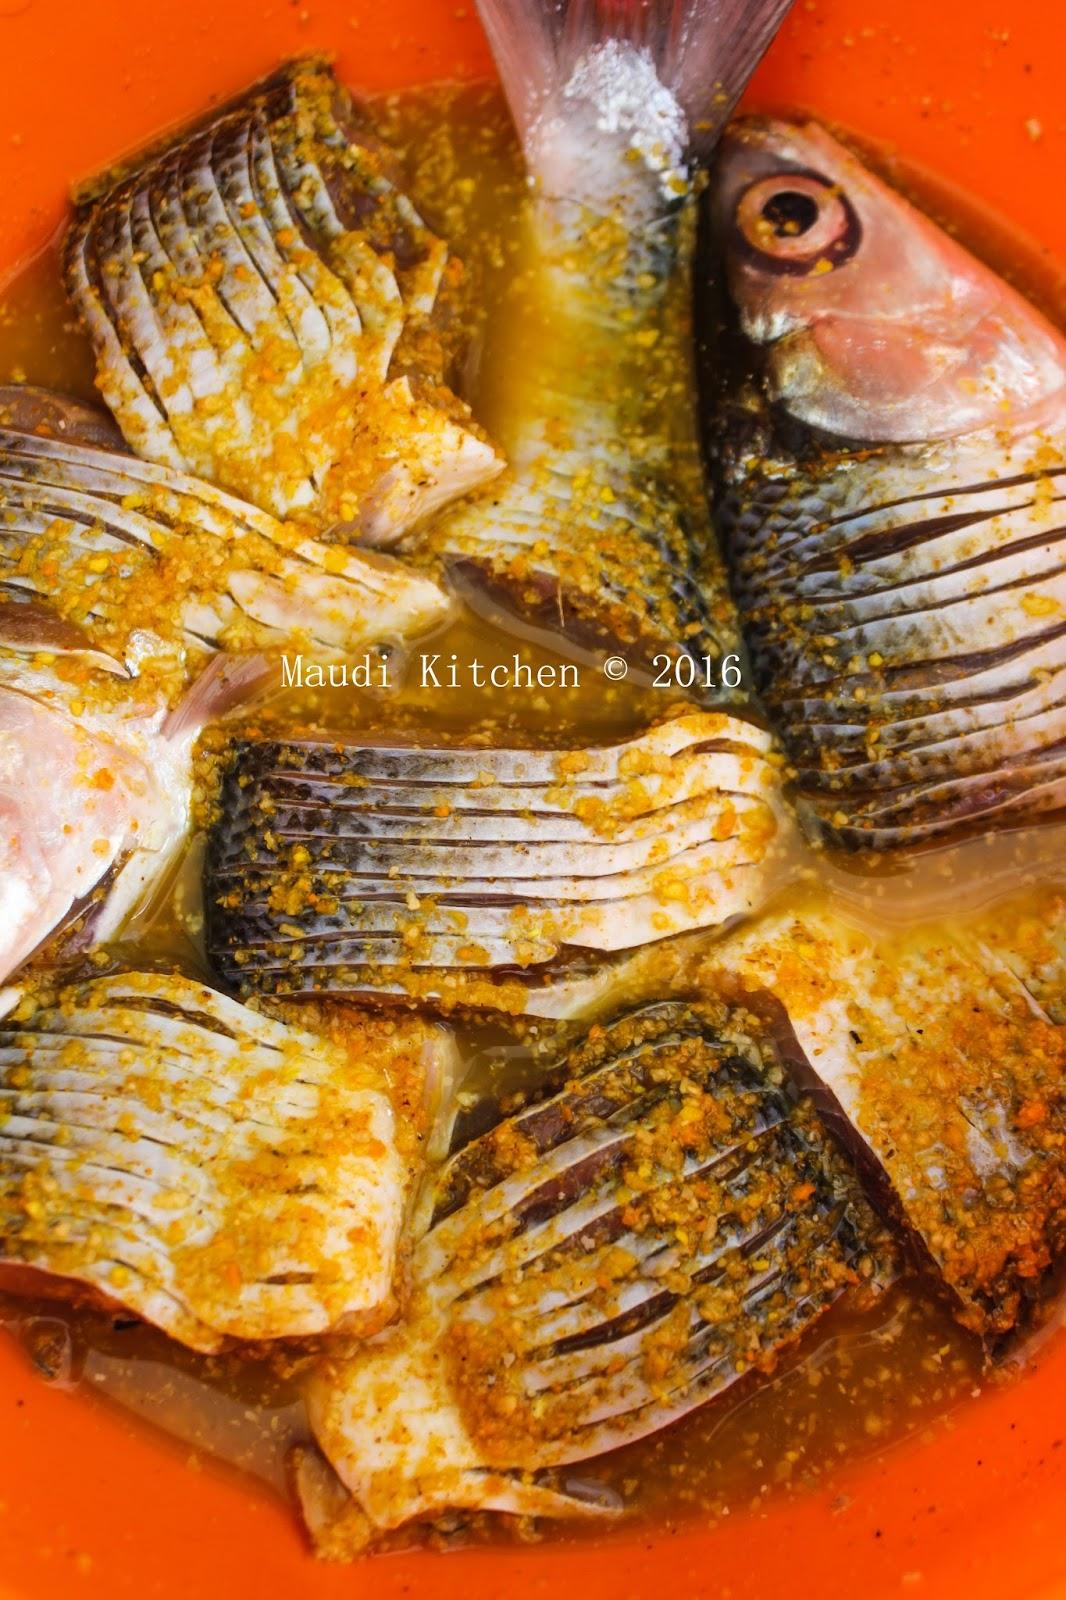 Maudi S Kitchen Bandeng Goreng Bebas Duri Tanpa Presto Makanan Ikan Resep Ikan Ide Makanan